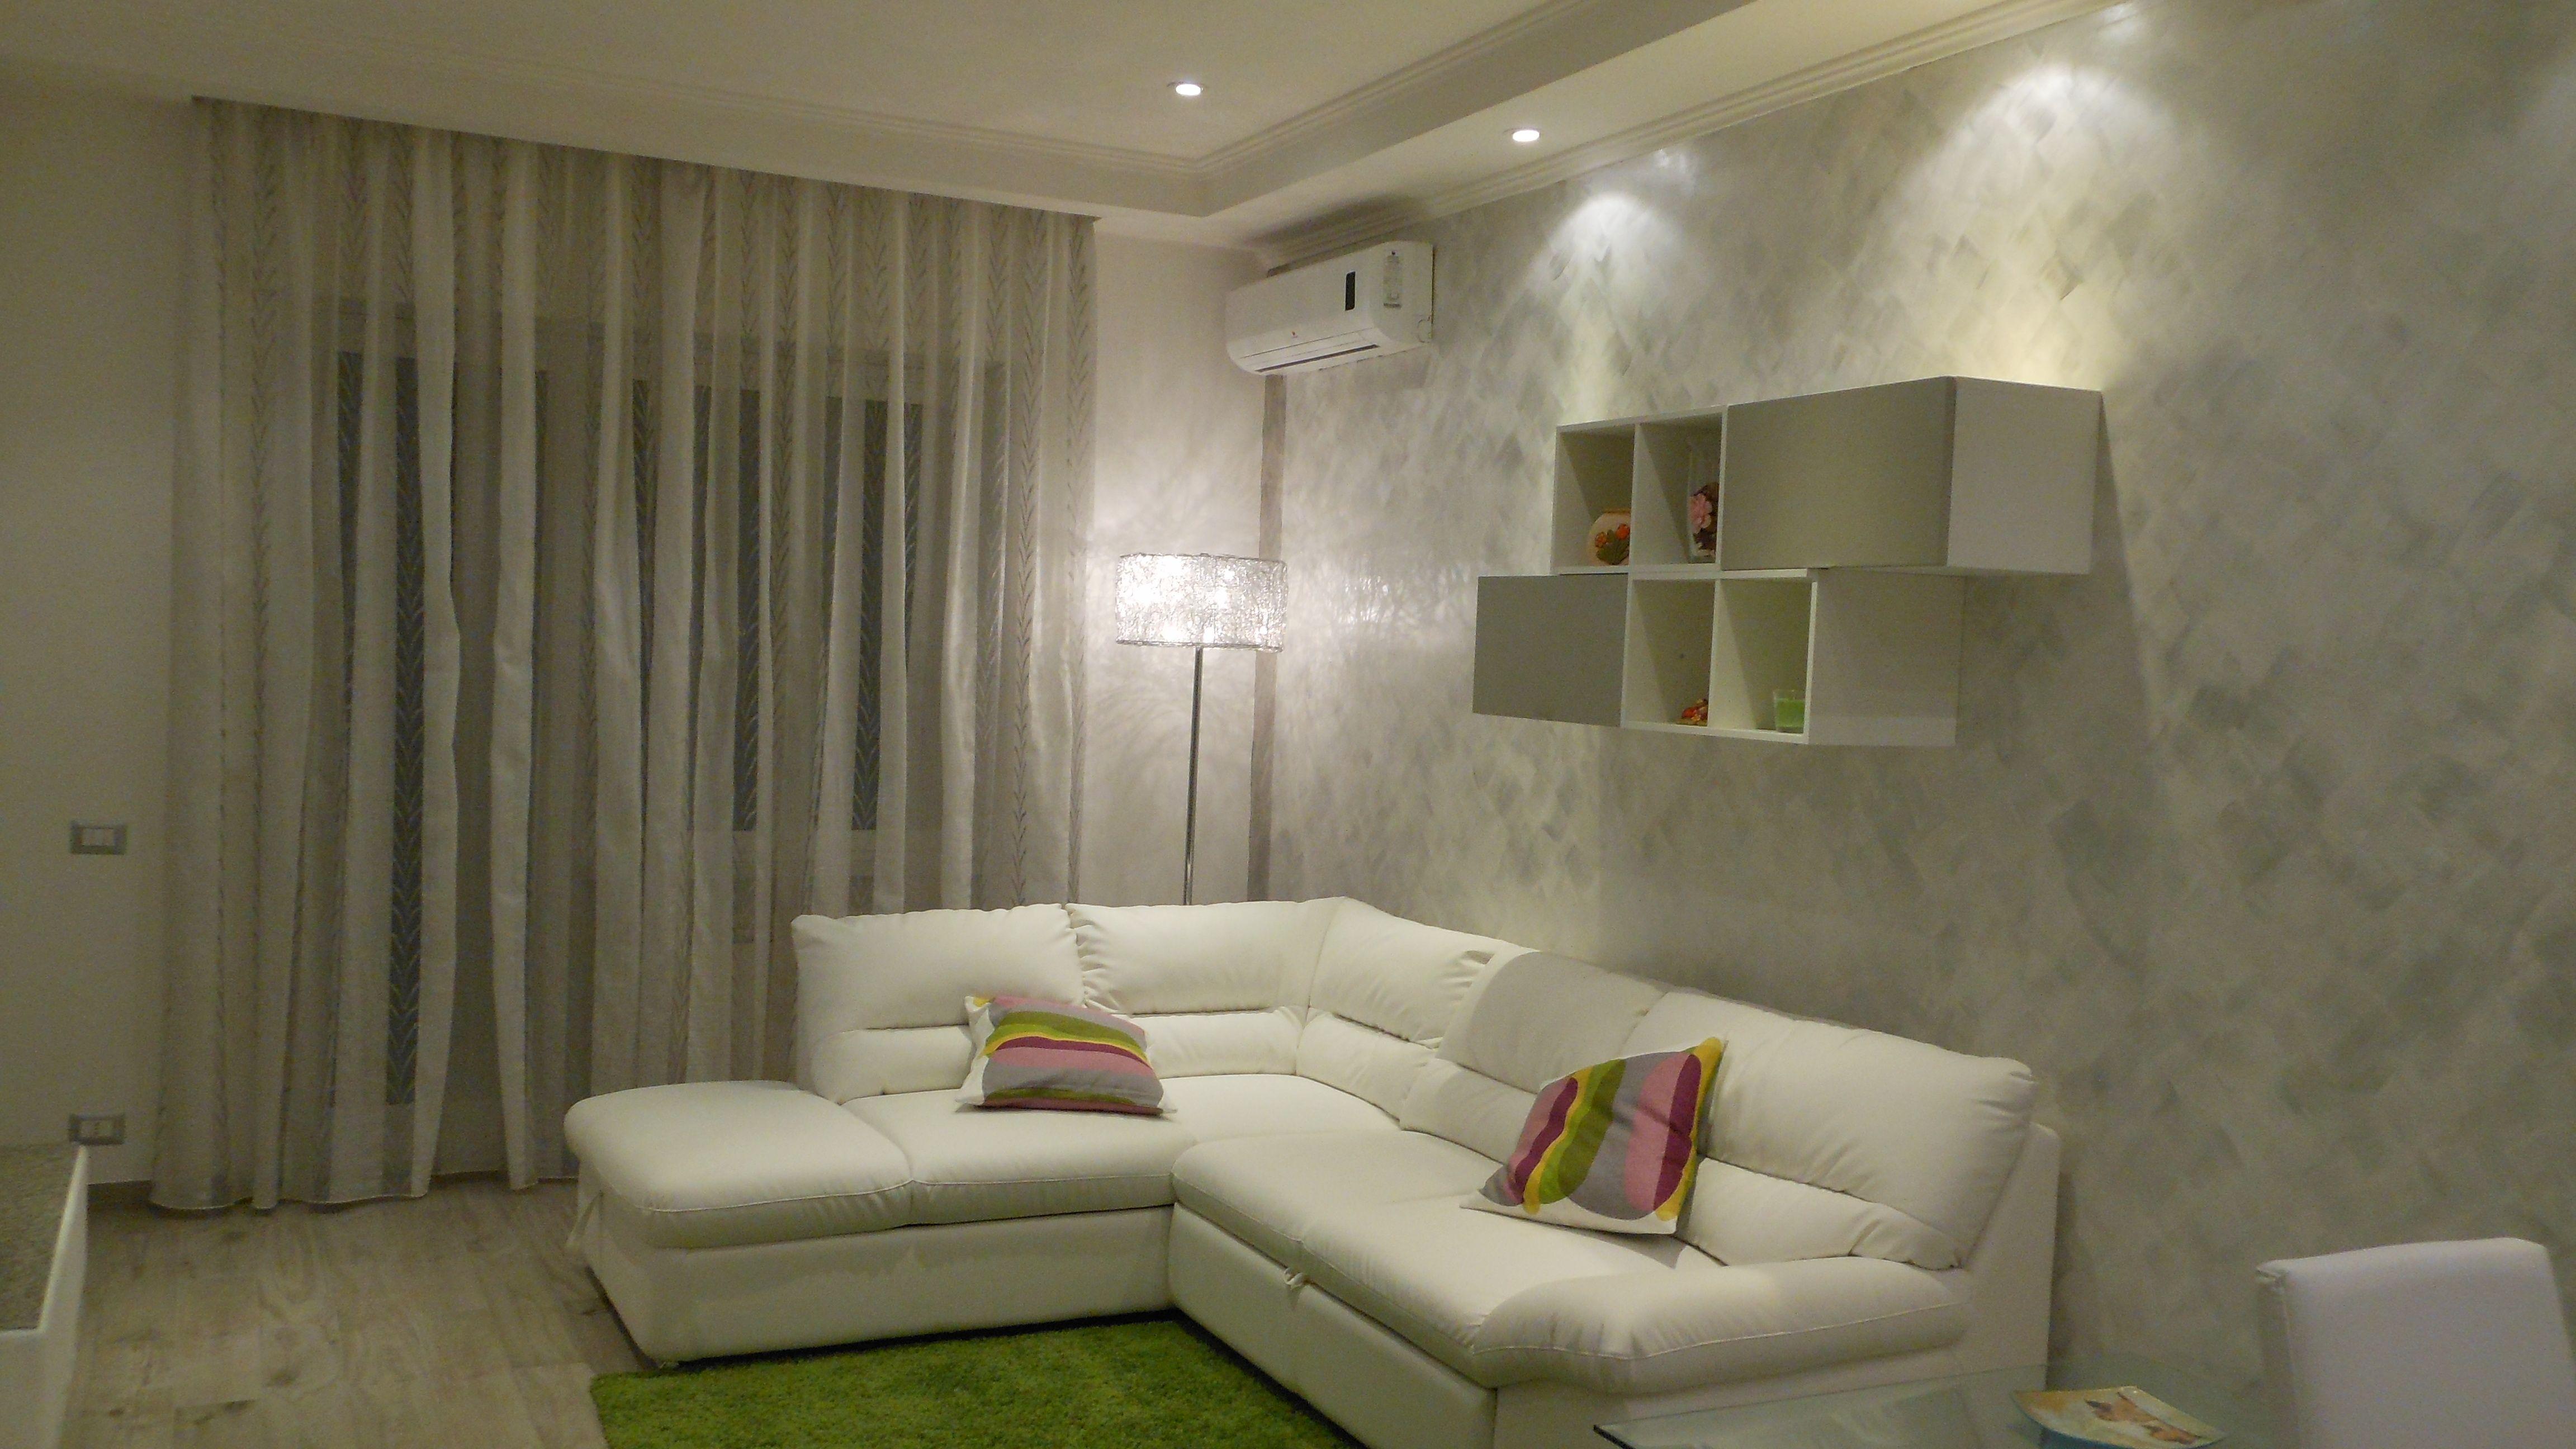 Pitture Murali Moderne Per Interni.Pittura Per Interni Effetto Simple Tinta Per Interni With Pittura